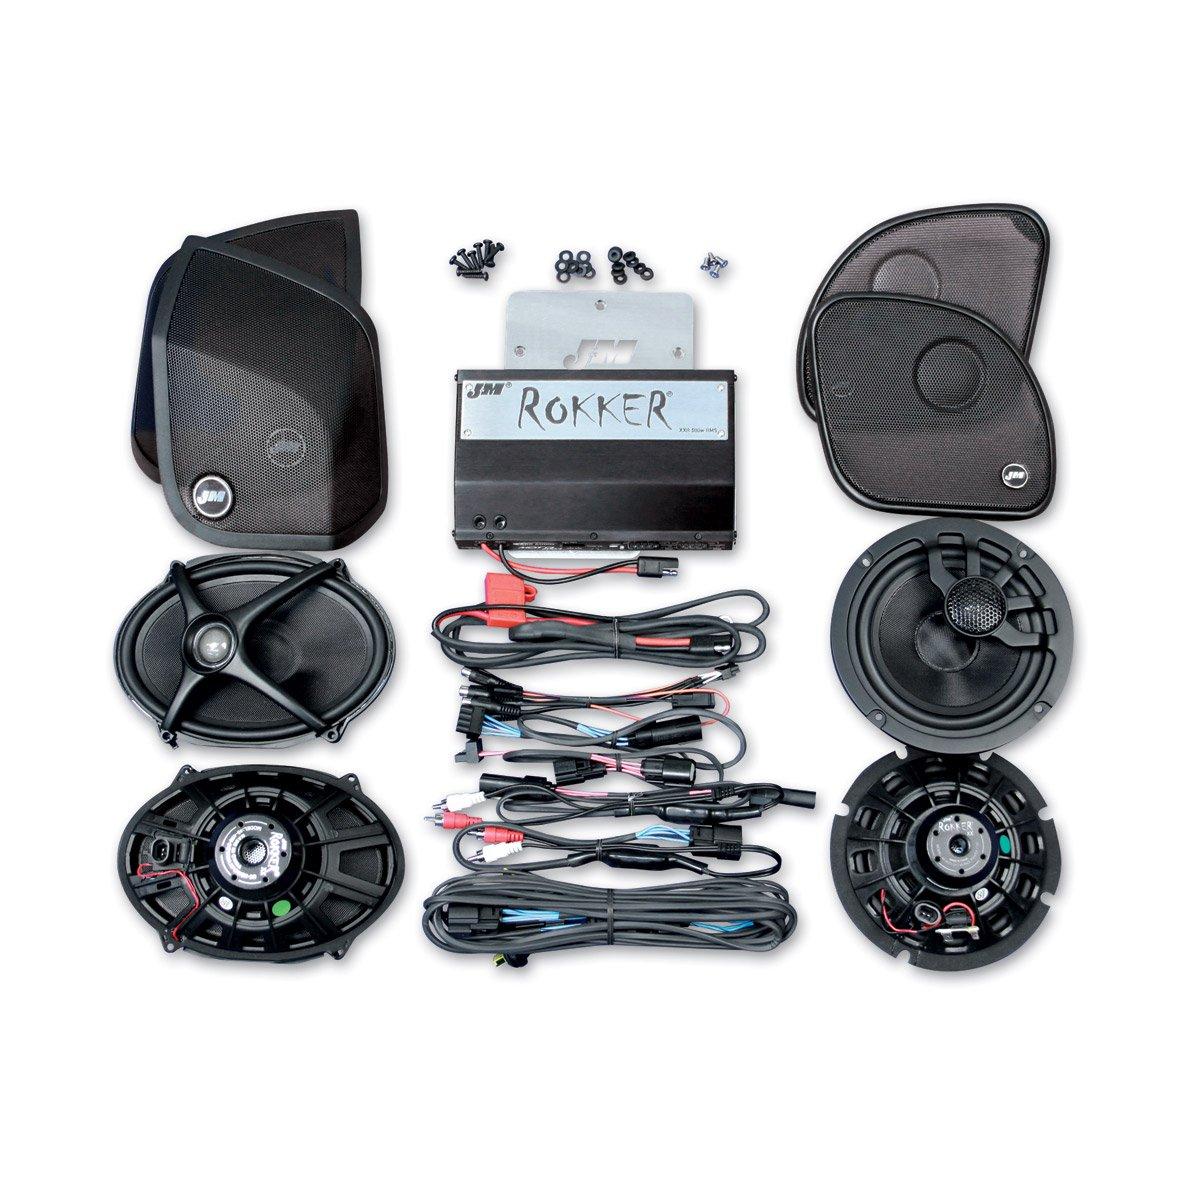 Jm Audio Rokker Extreme Xxrk Four Speaker And 630 Watt Amp Kit For 2014 Harley Saddlebag Wiring Diagram 2015 Newer Davidson Road Glide Models 630sp4 15rc Car